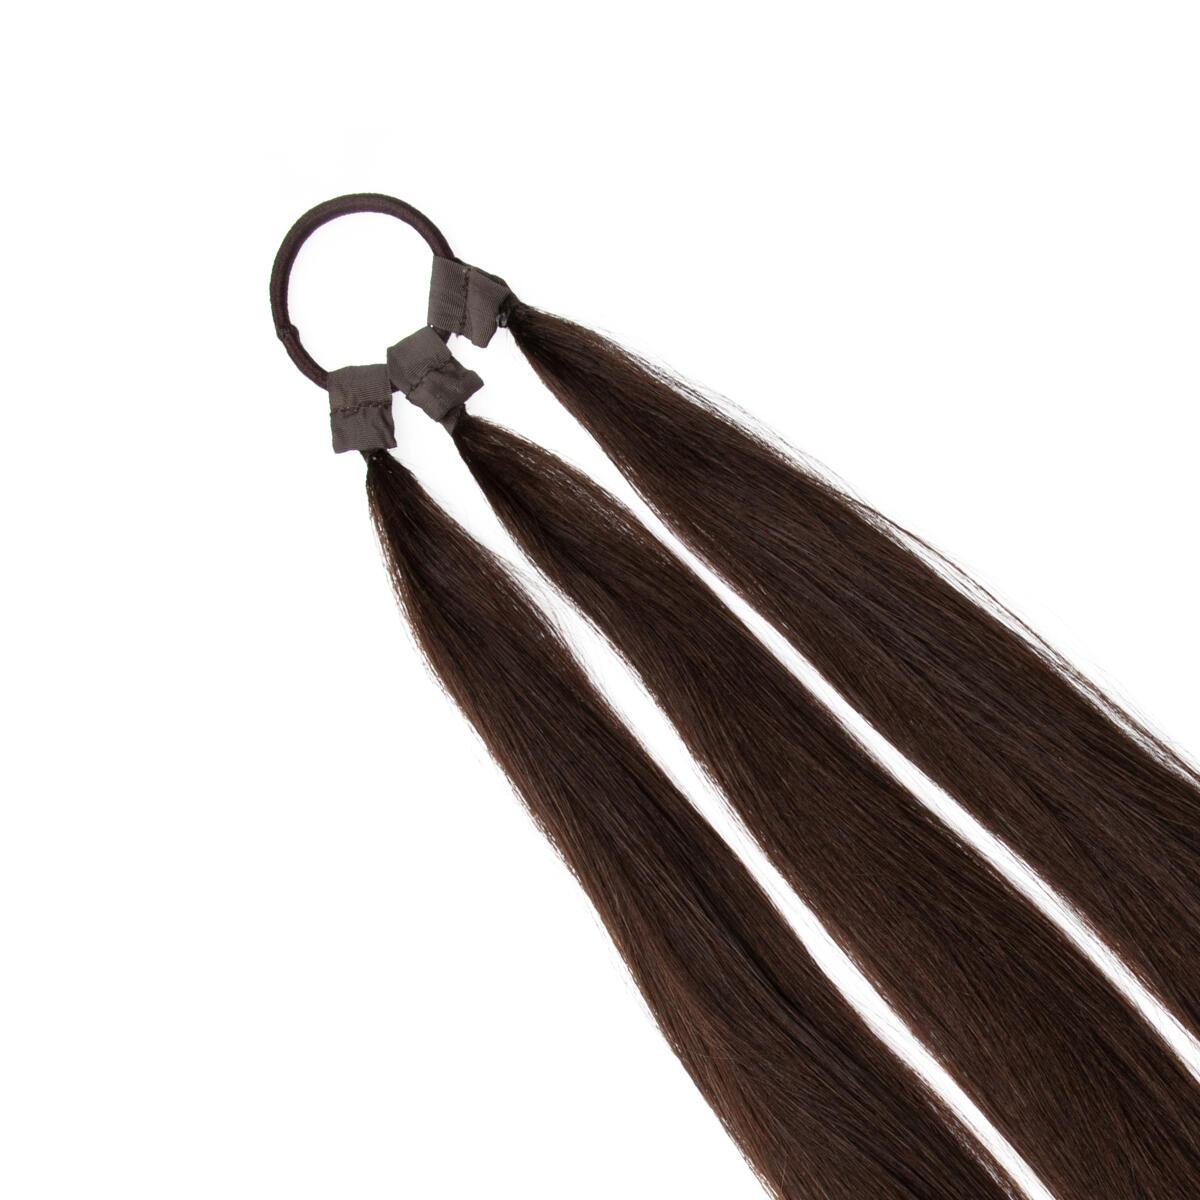 Easy Braid For voluminous braids 2.3 Chocolate Brown 55 cm